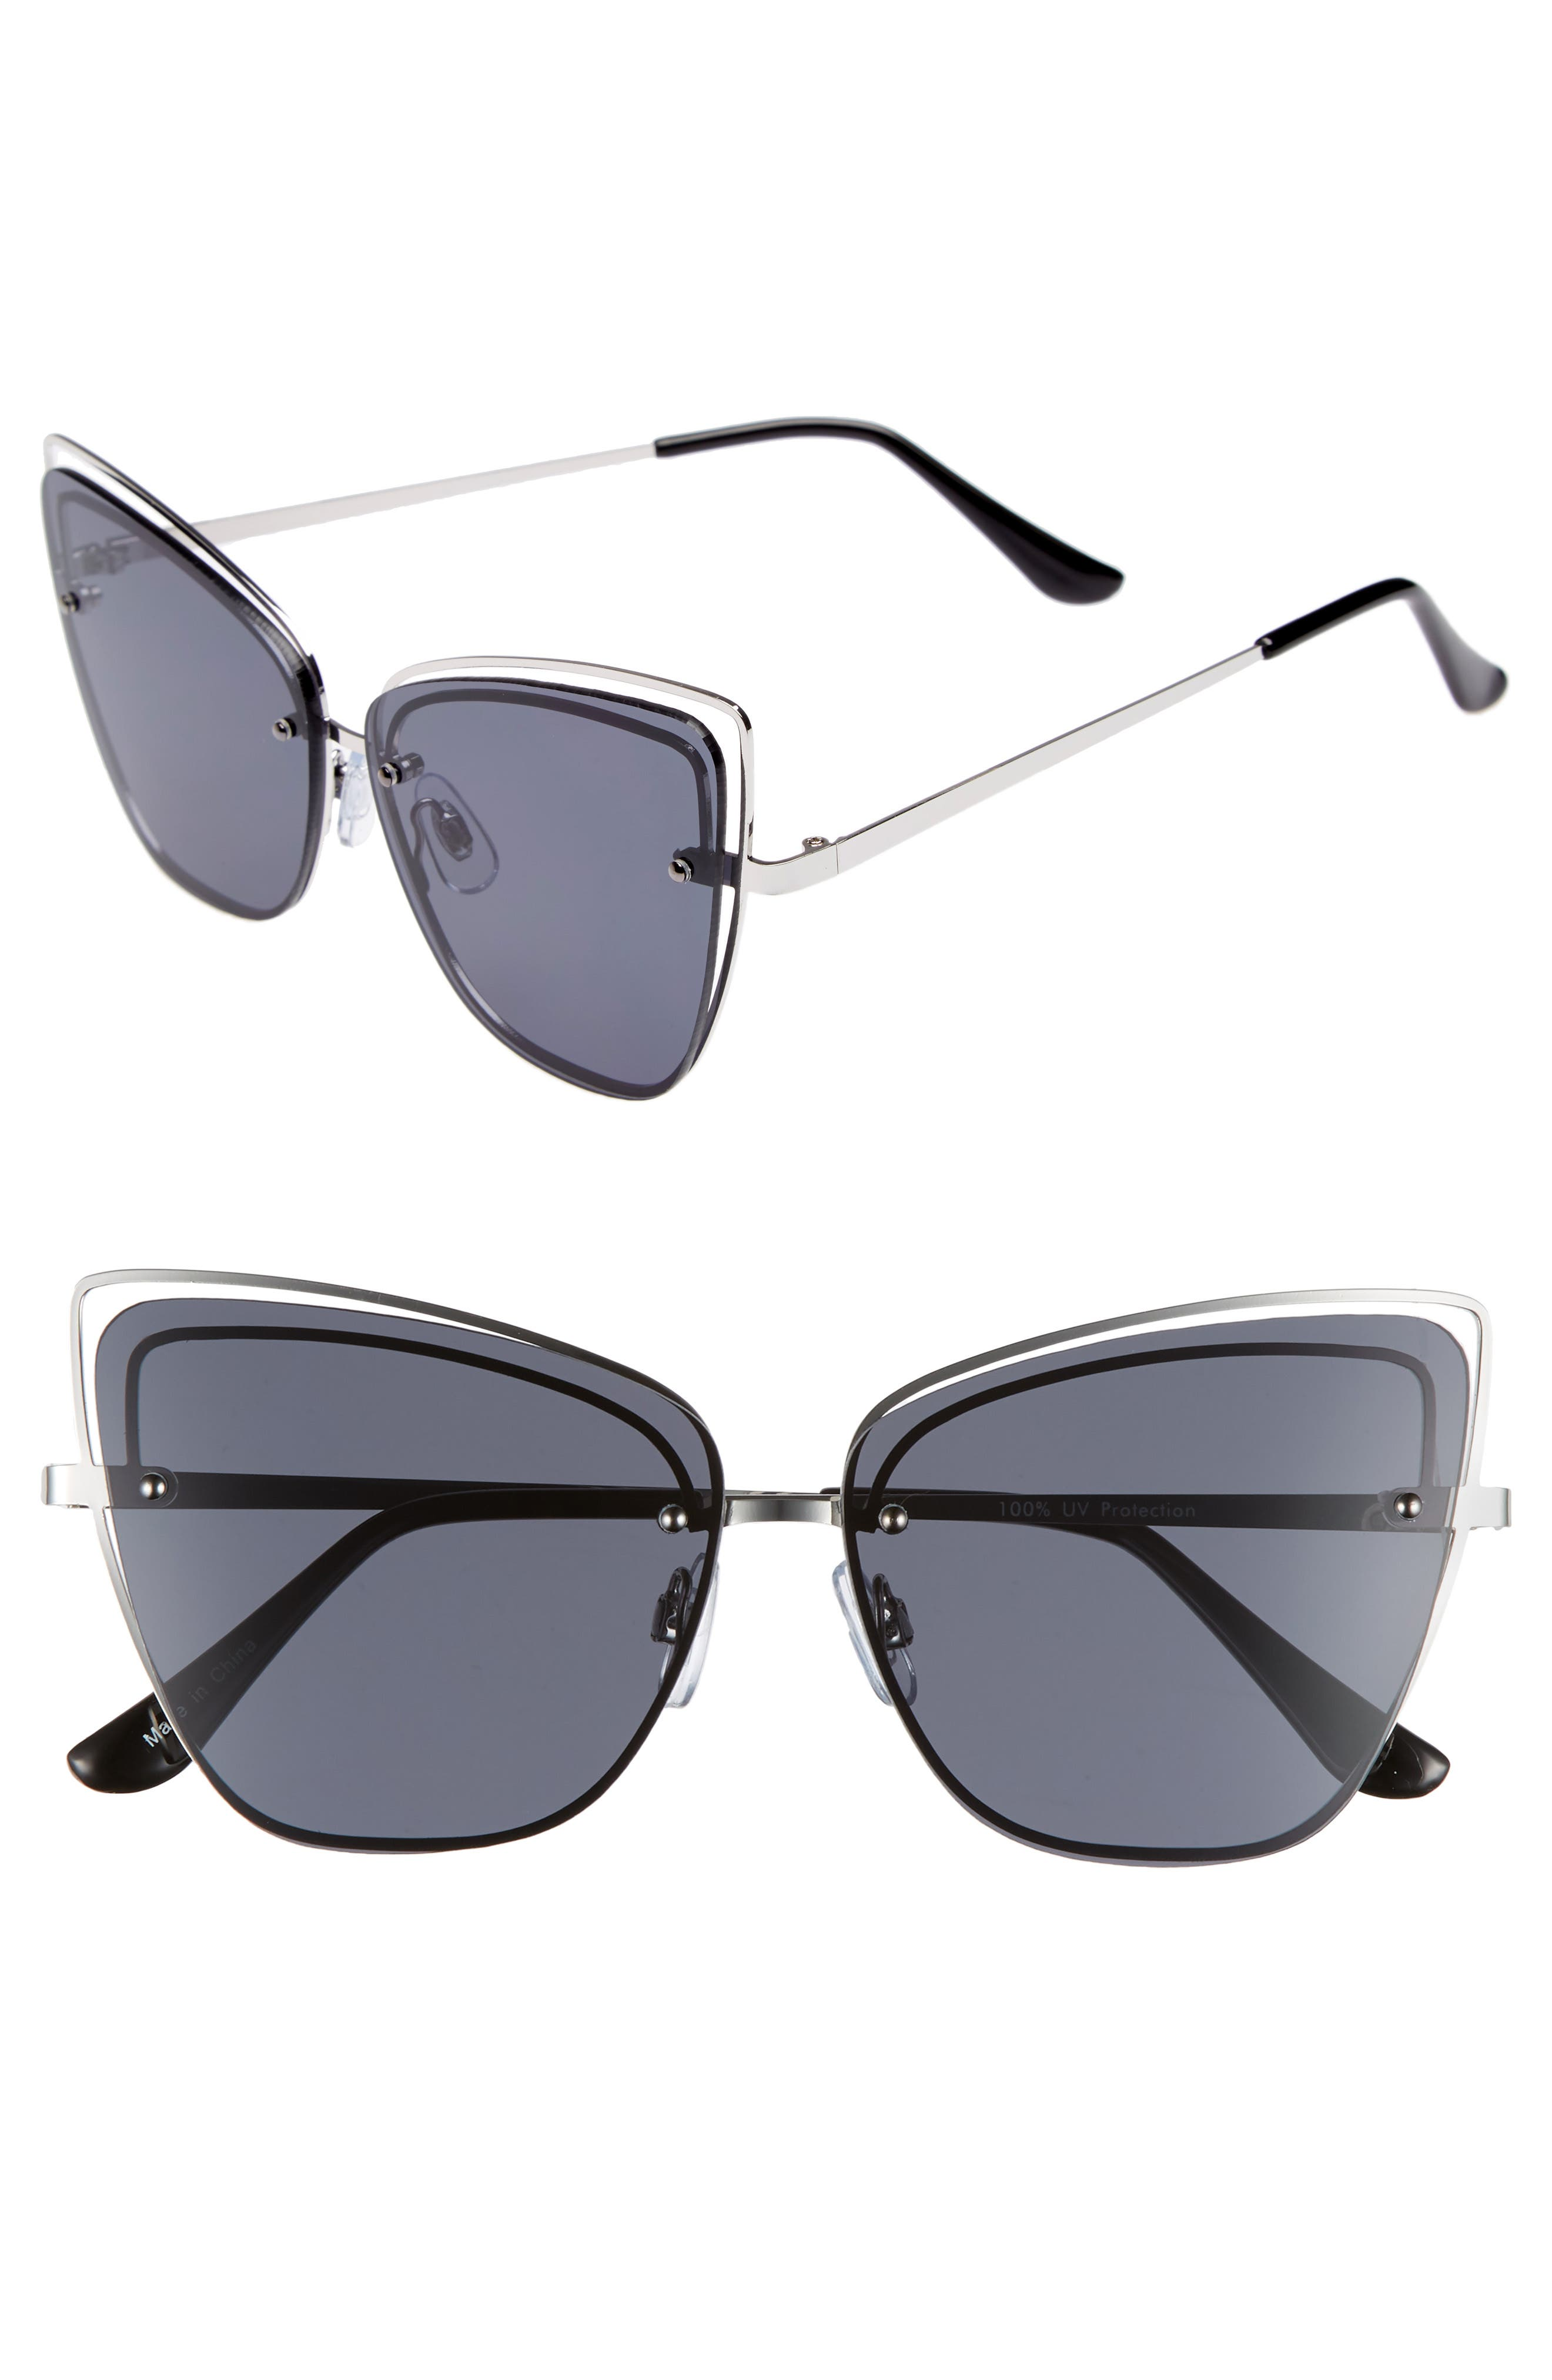 Dainty 53mm Rimless Cat Eye Sunglasses,                             Main thumbnail 1, color,                             SILVER/ BLACK